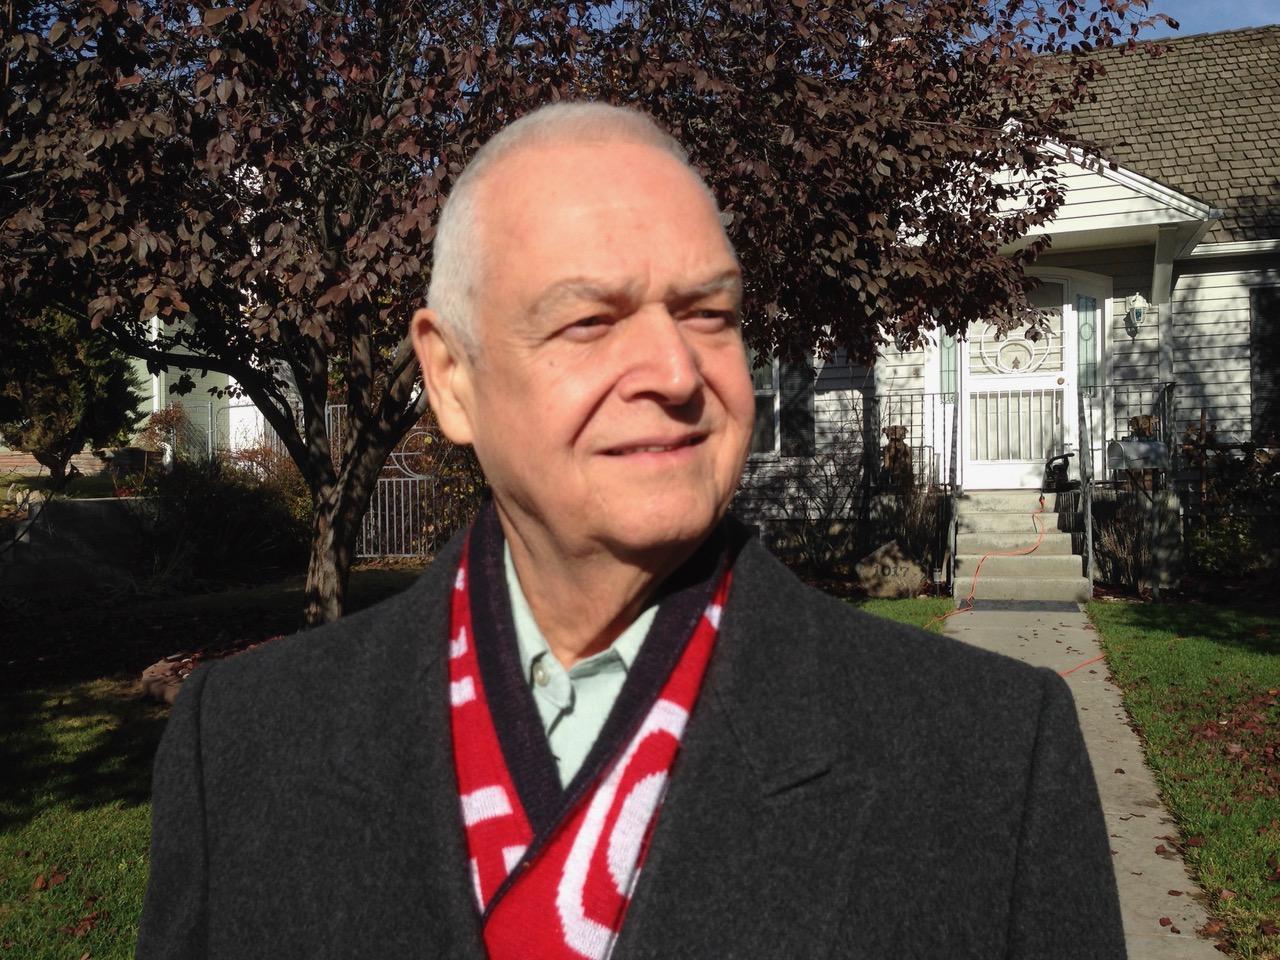 Ontario Mayor Talks Possibility Of Pot In Idaho Border Town | Boise